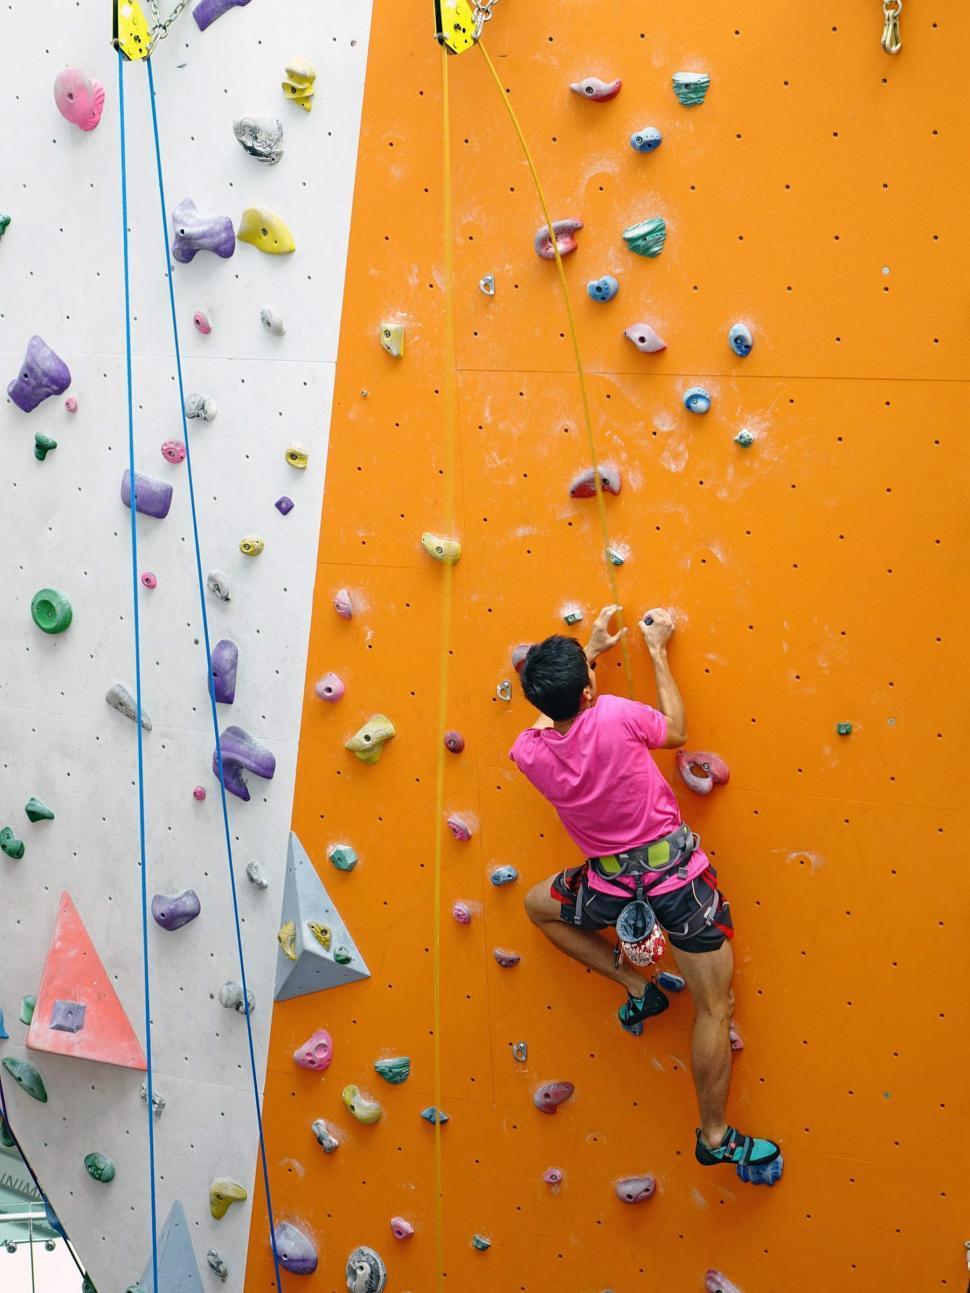 Download Free Stock Photo of Indoor rock climbing